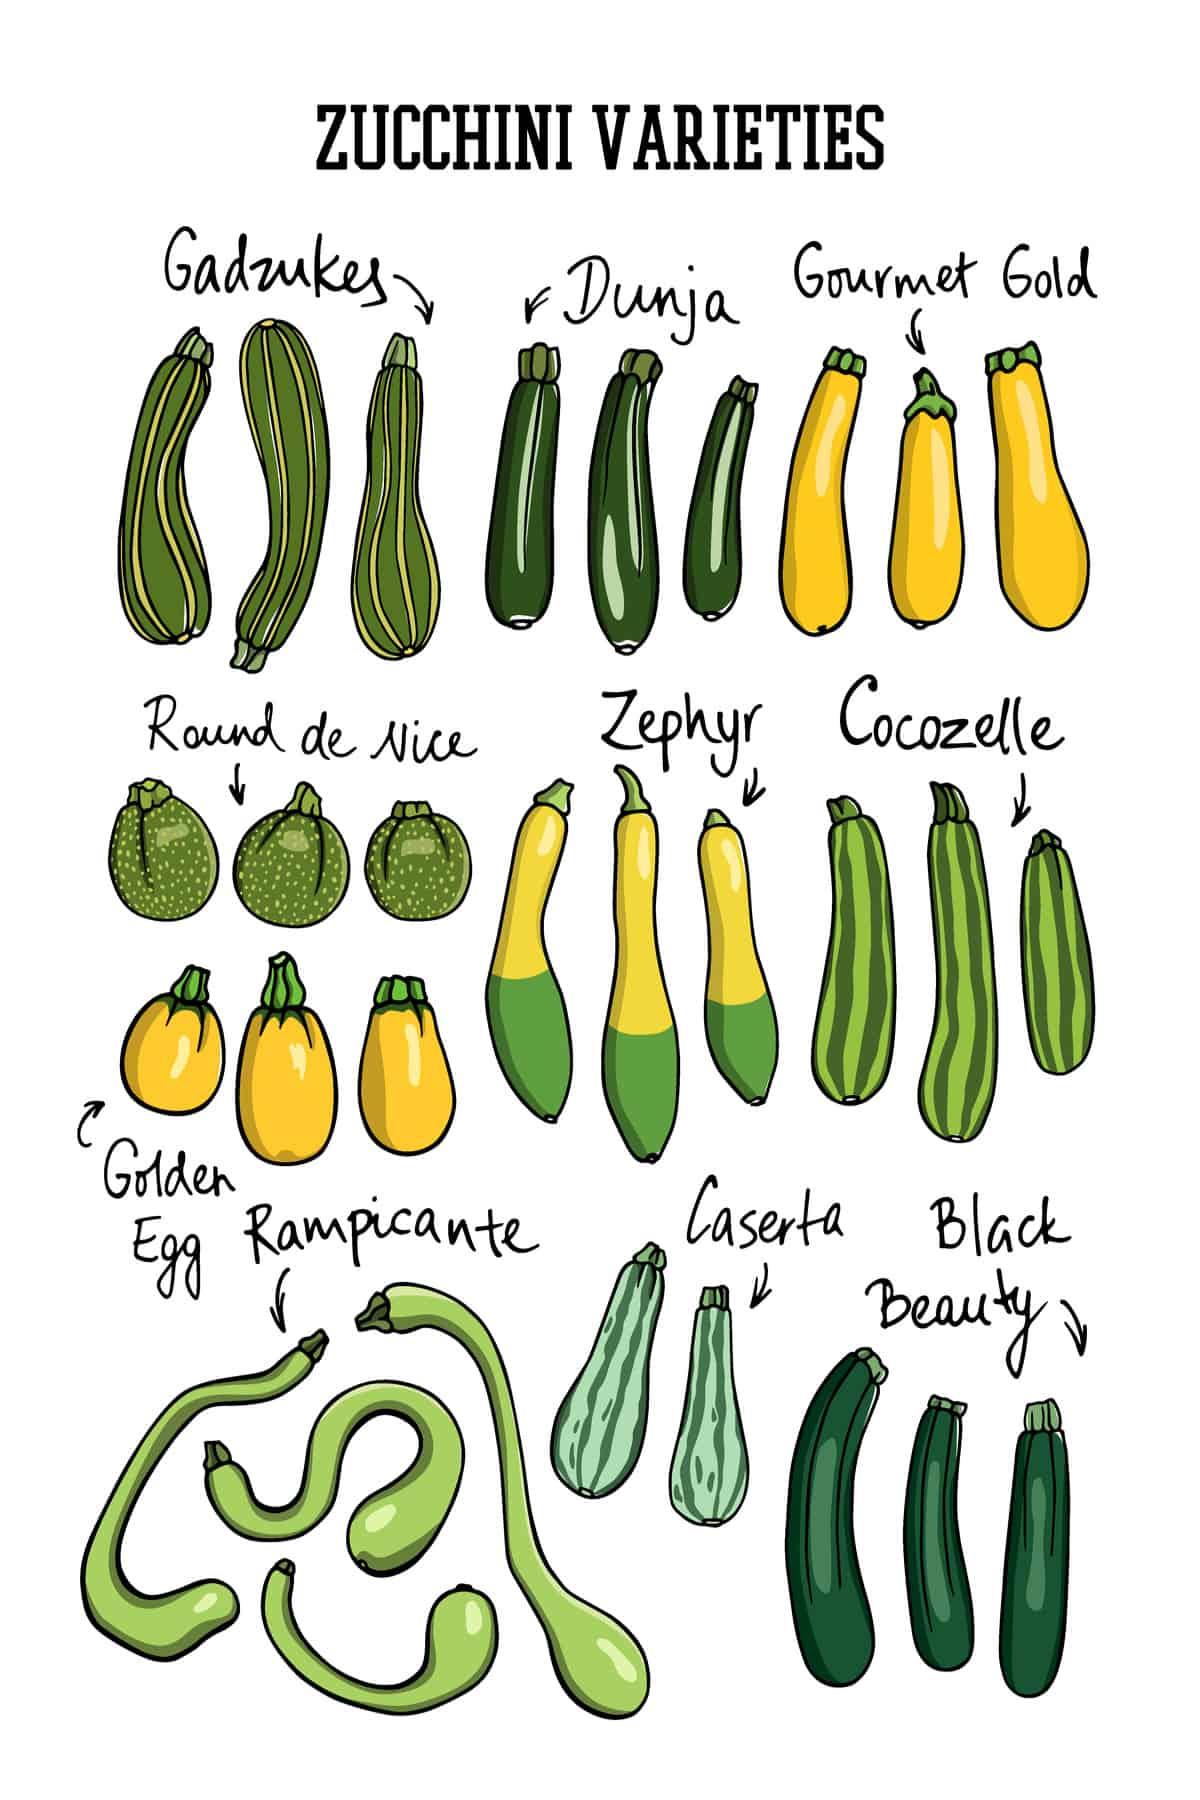 Zucchini types chart